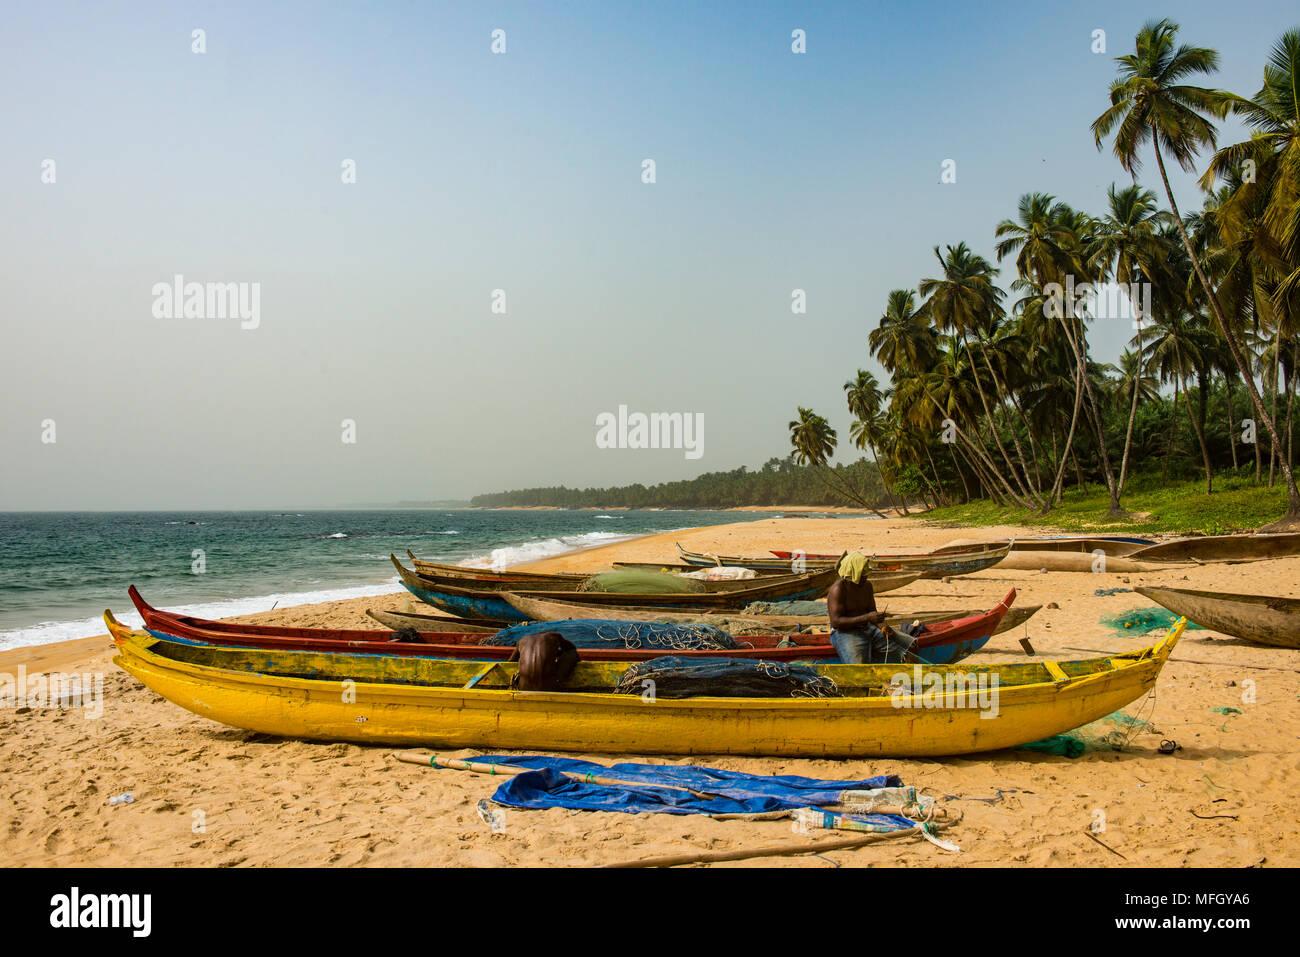 Fishing boats on a beautiful beach, Neekreen near Buchanan, Liberia, West Africa, Africa - Stock Image